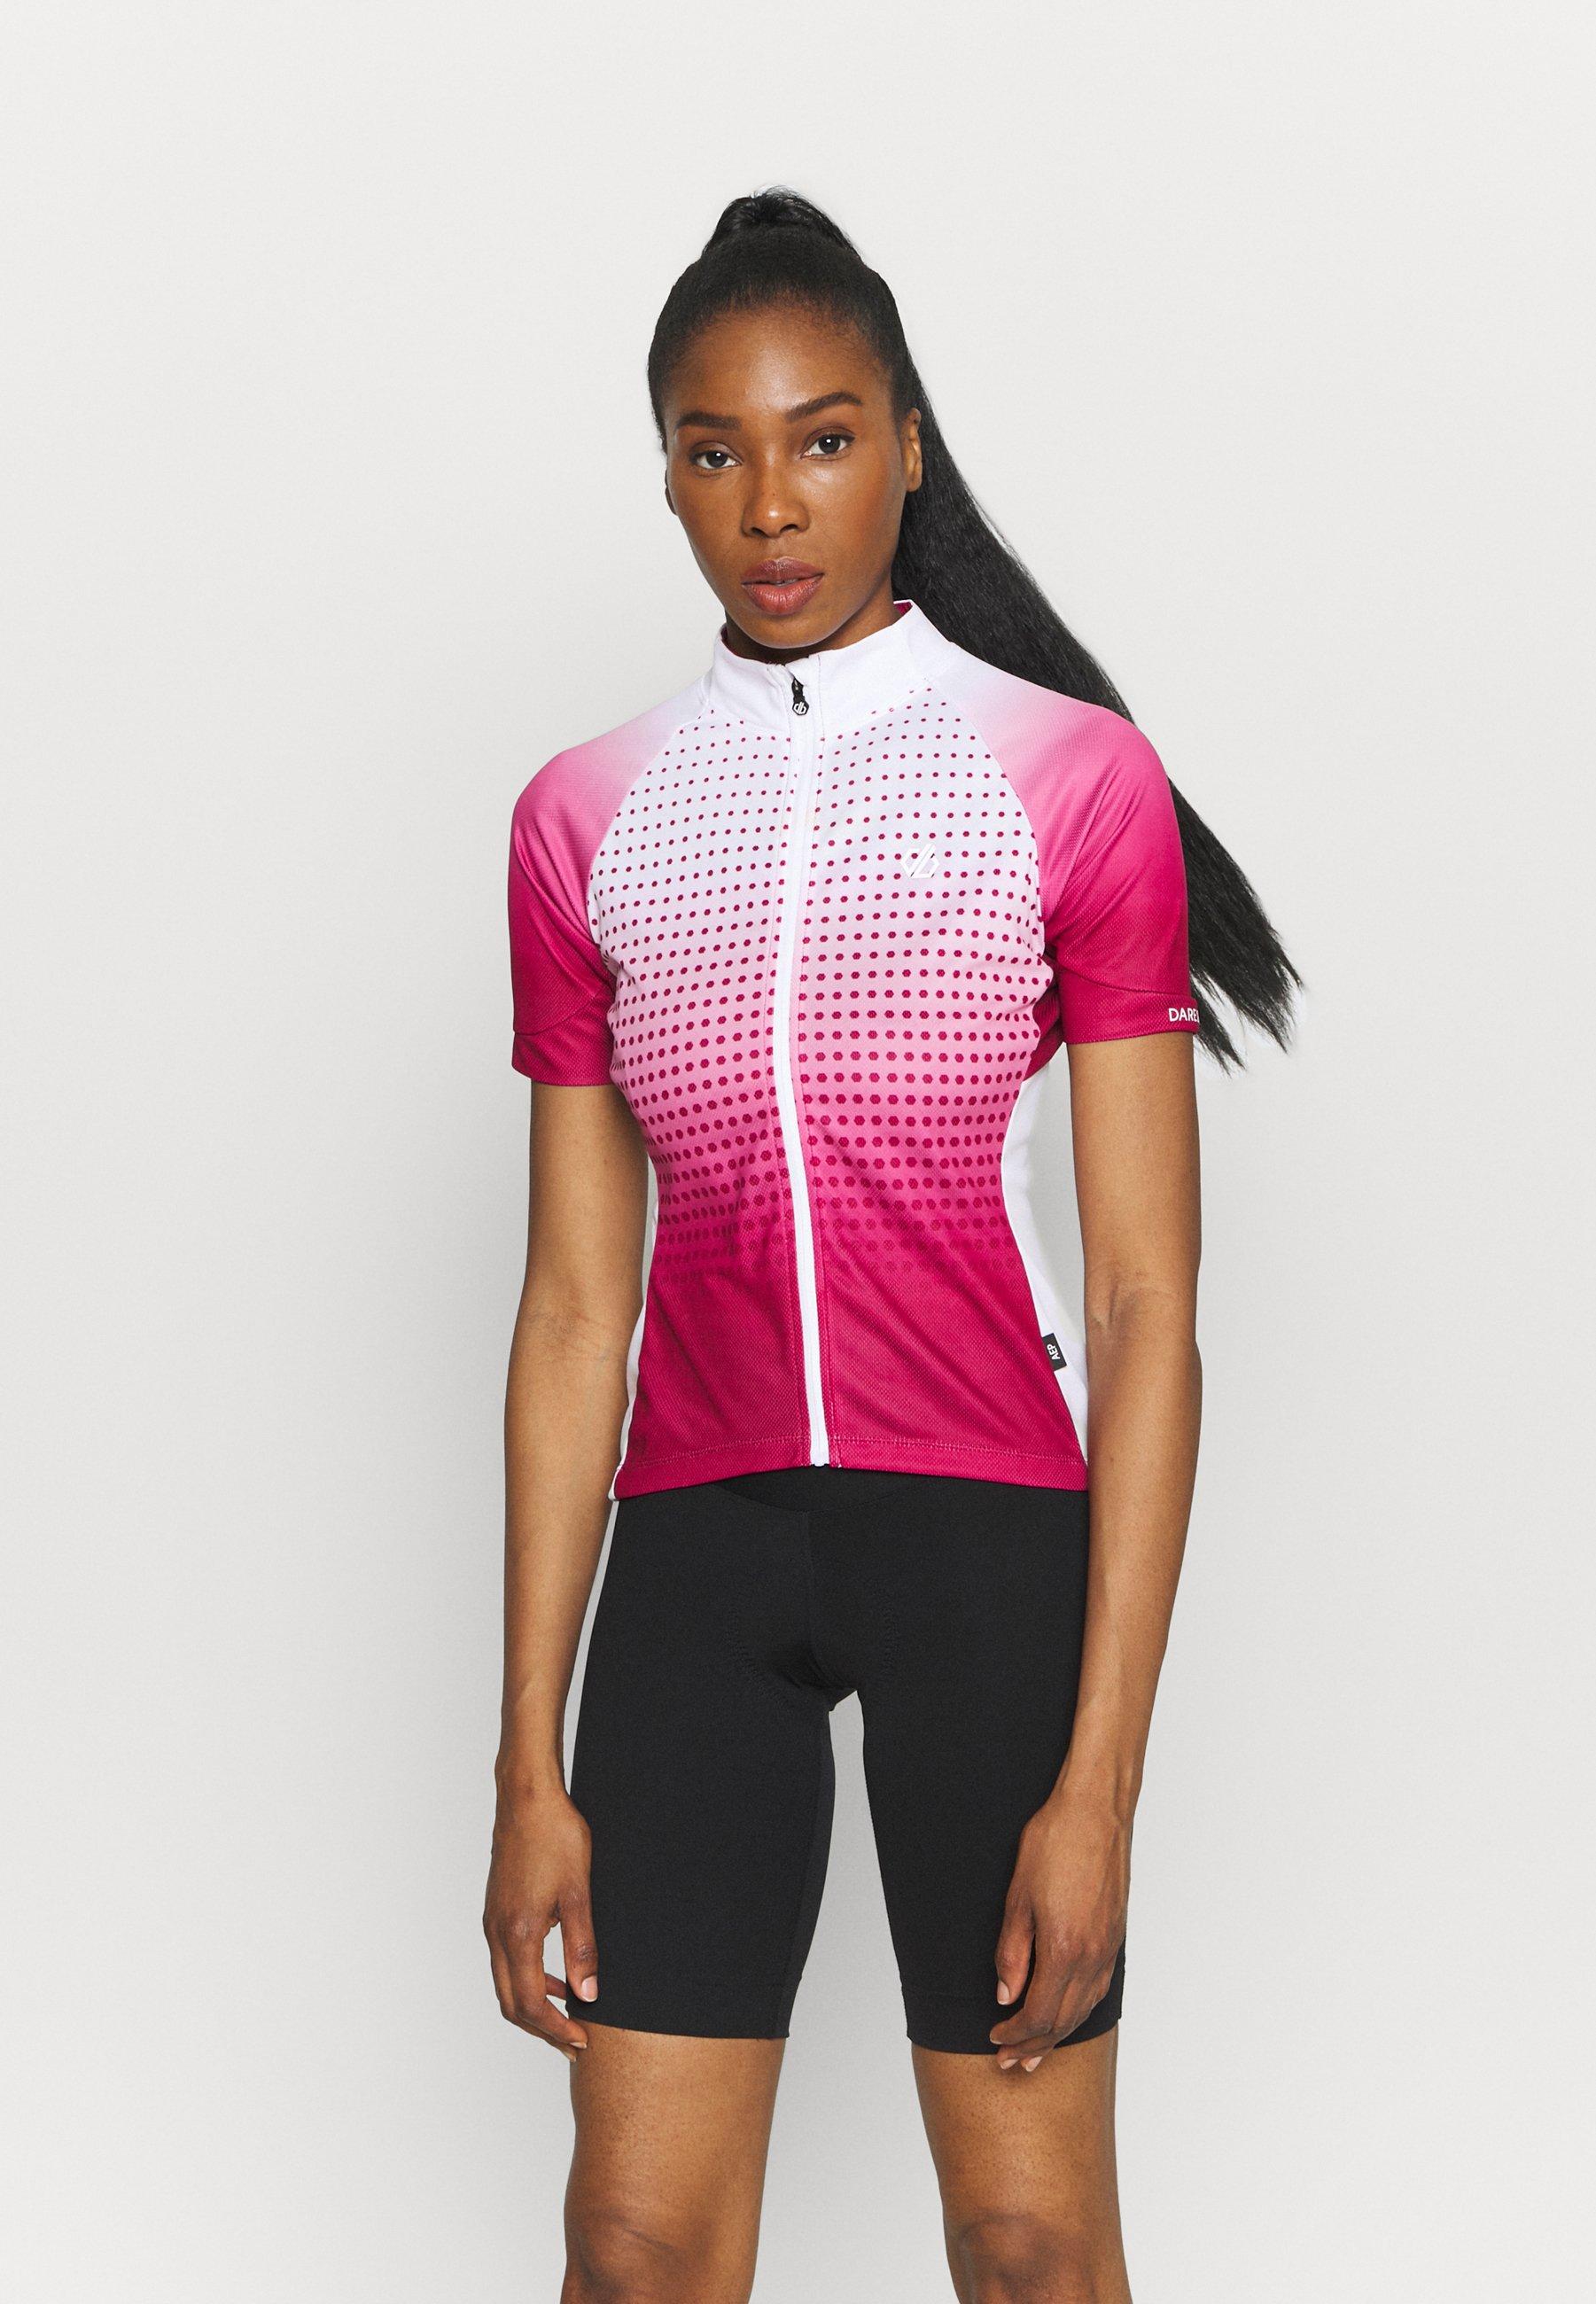 Femme PROPELL  - Maillot de cycliste